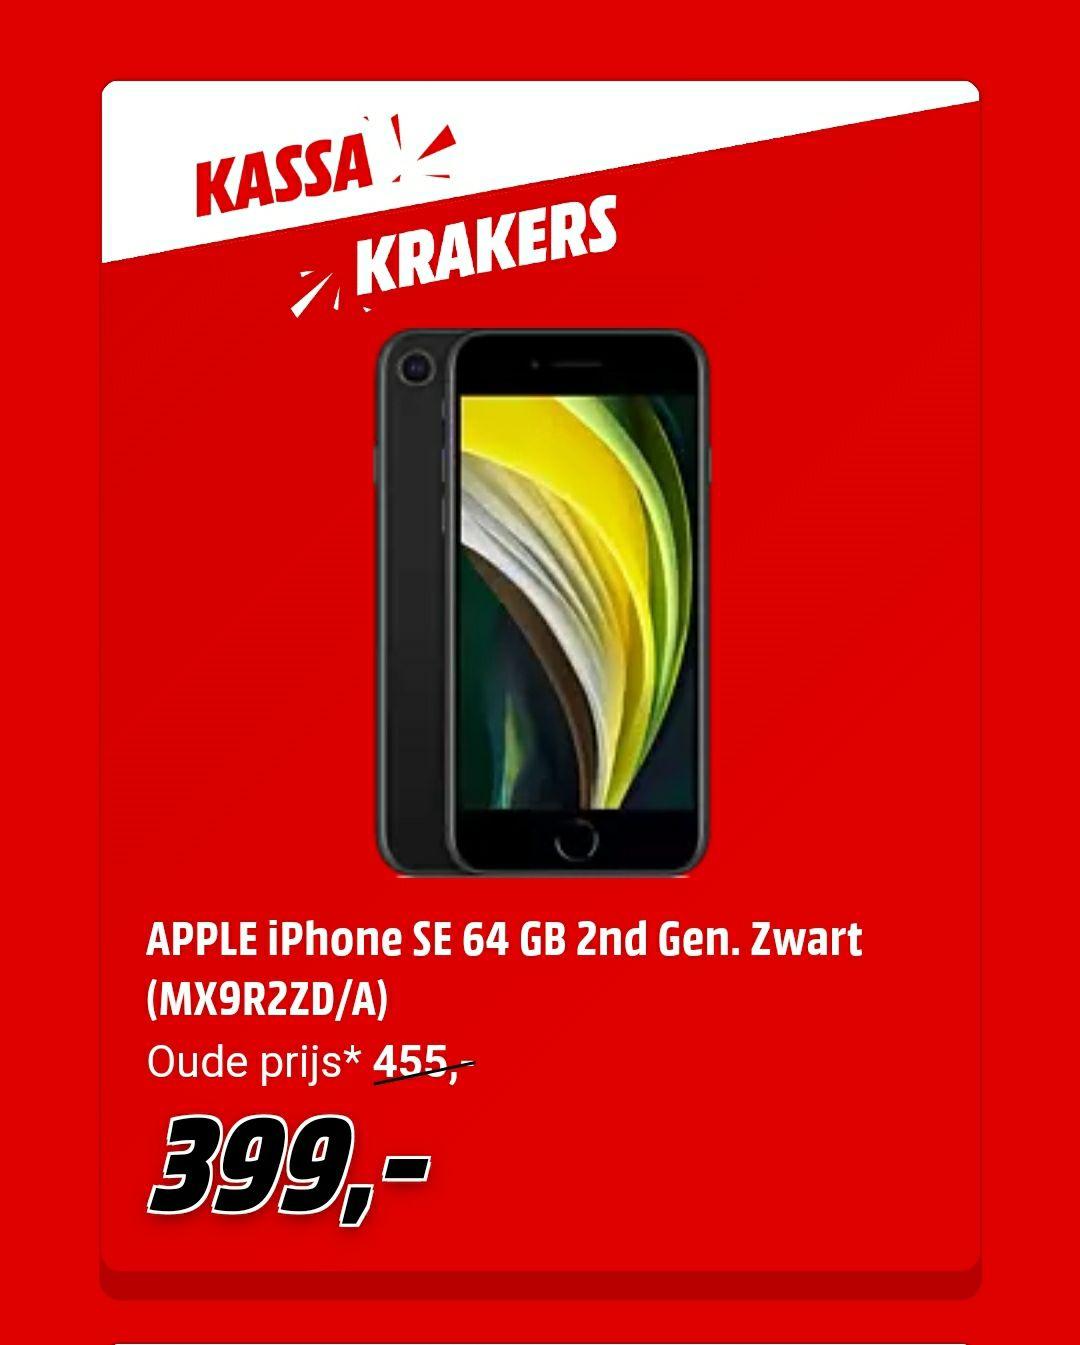 [Grensdeal BE] iPhone SE 2020 64GB 399€ @Mediamarkt BE